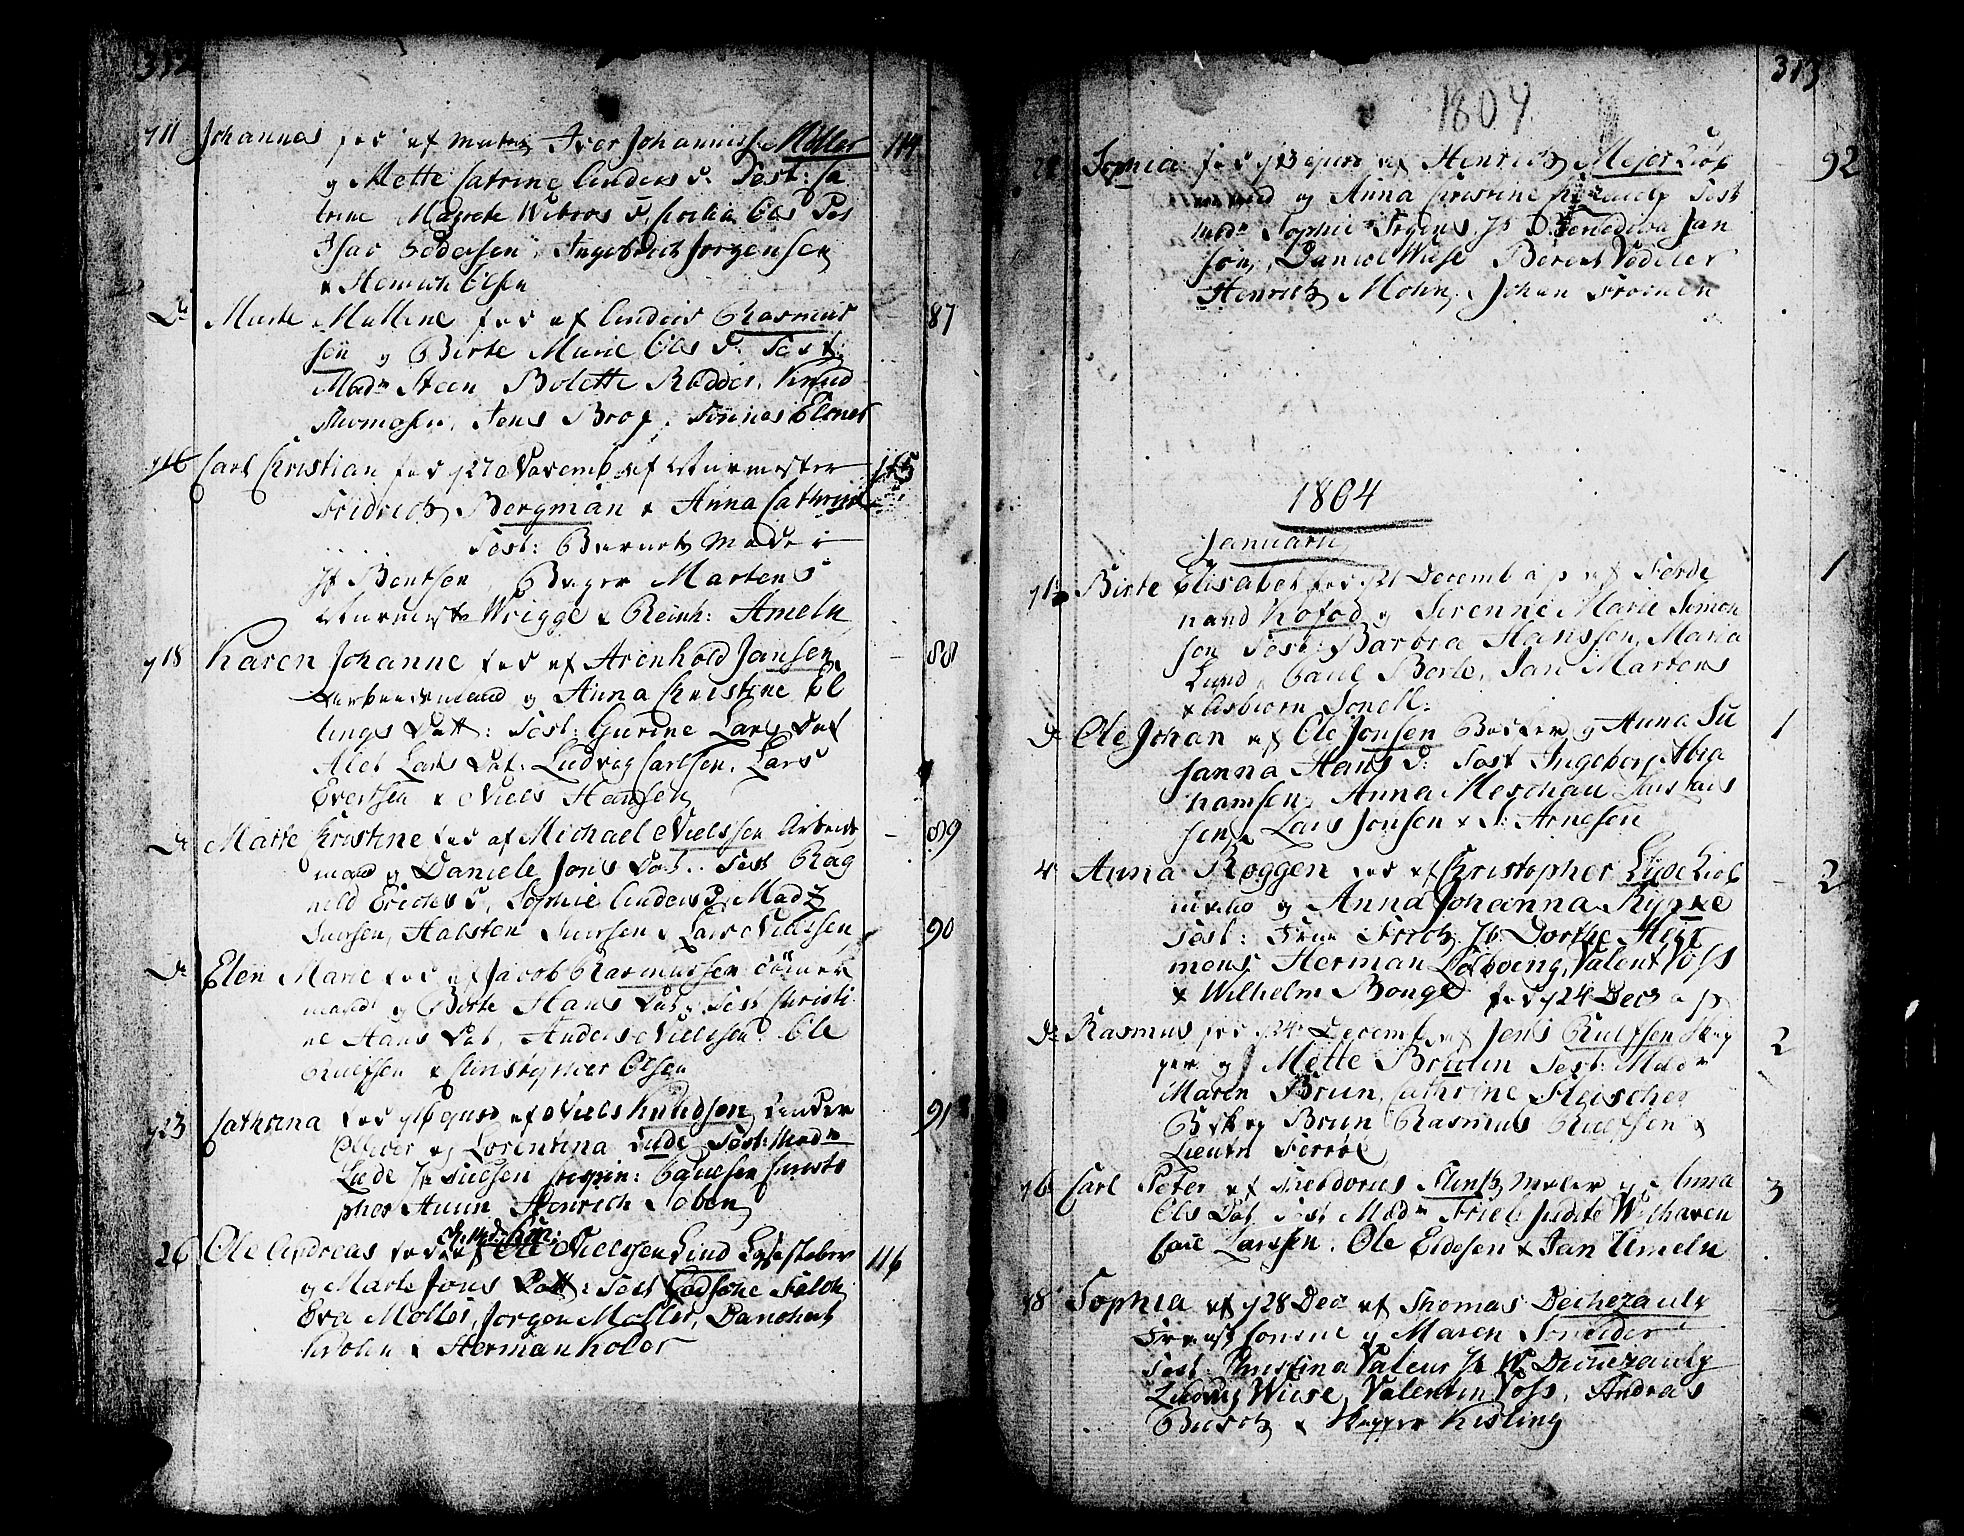 SAB, Domkirken sokneprestembete, H/Haa/L0004: Parish register (official) no. A 4, 1763-1820, p. 312-313